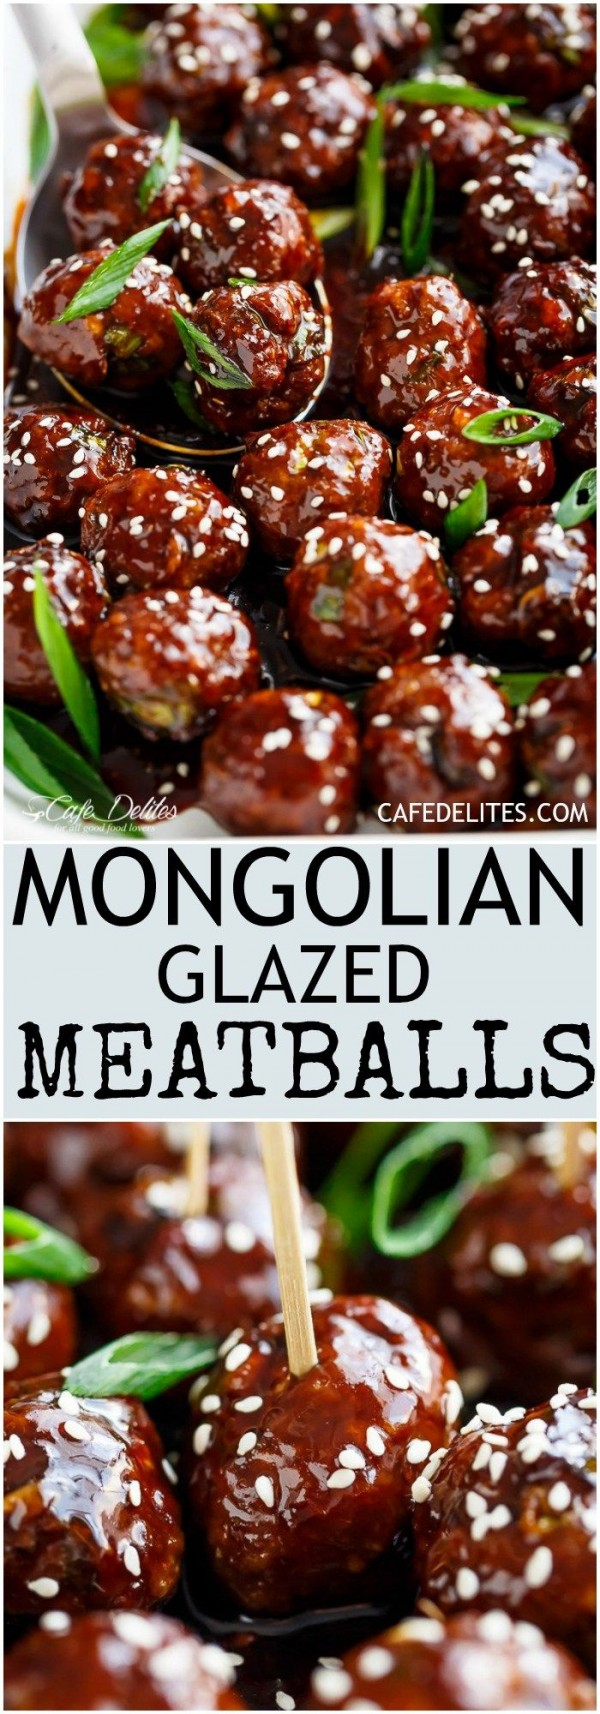 Get the recipe Mongolian Glazed Meatballs @recipes_to_go